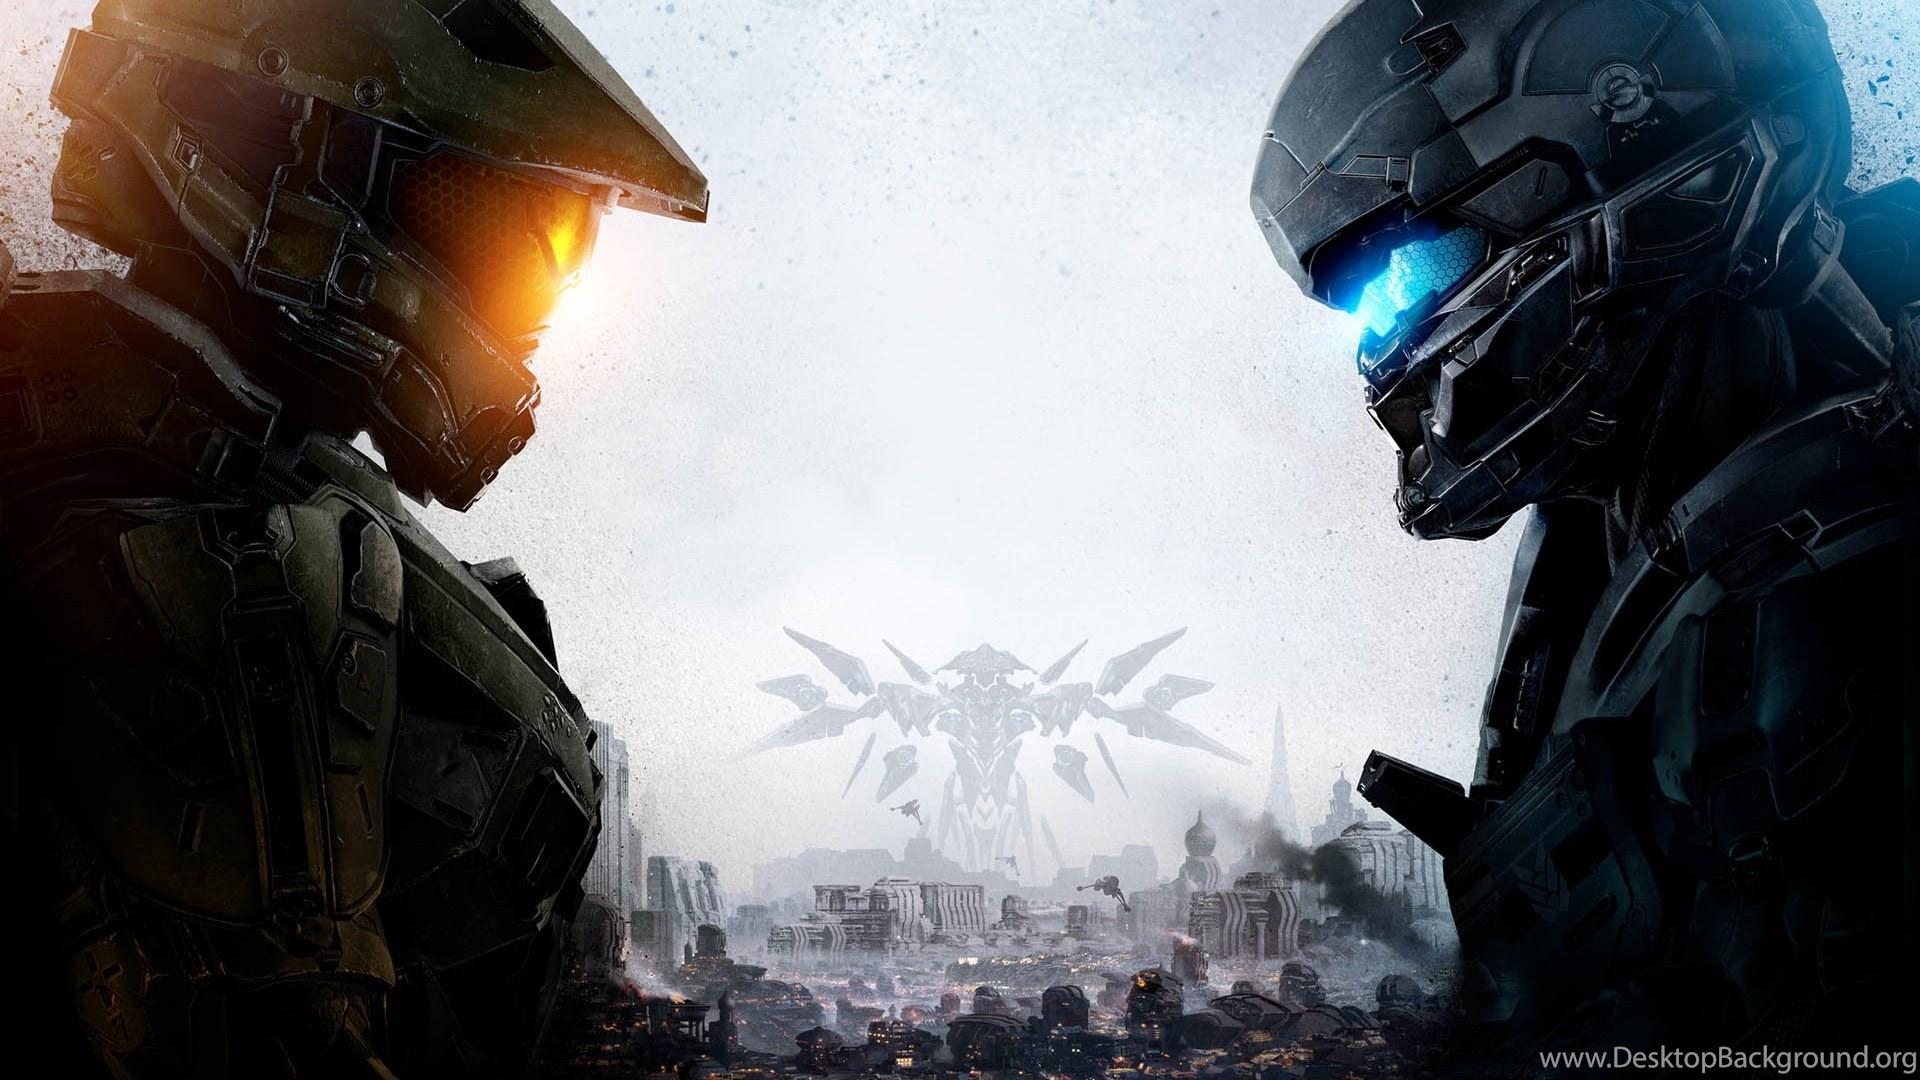 Halo 5 Guardians Wallpaper: Desktop Wallpapers Halo 5: Guardians Games Desktop Background